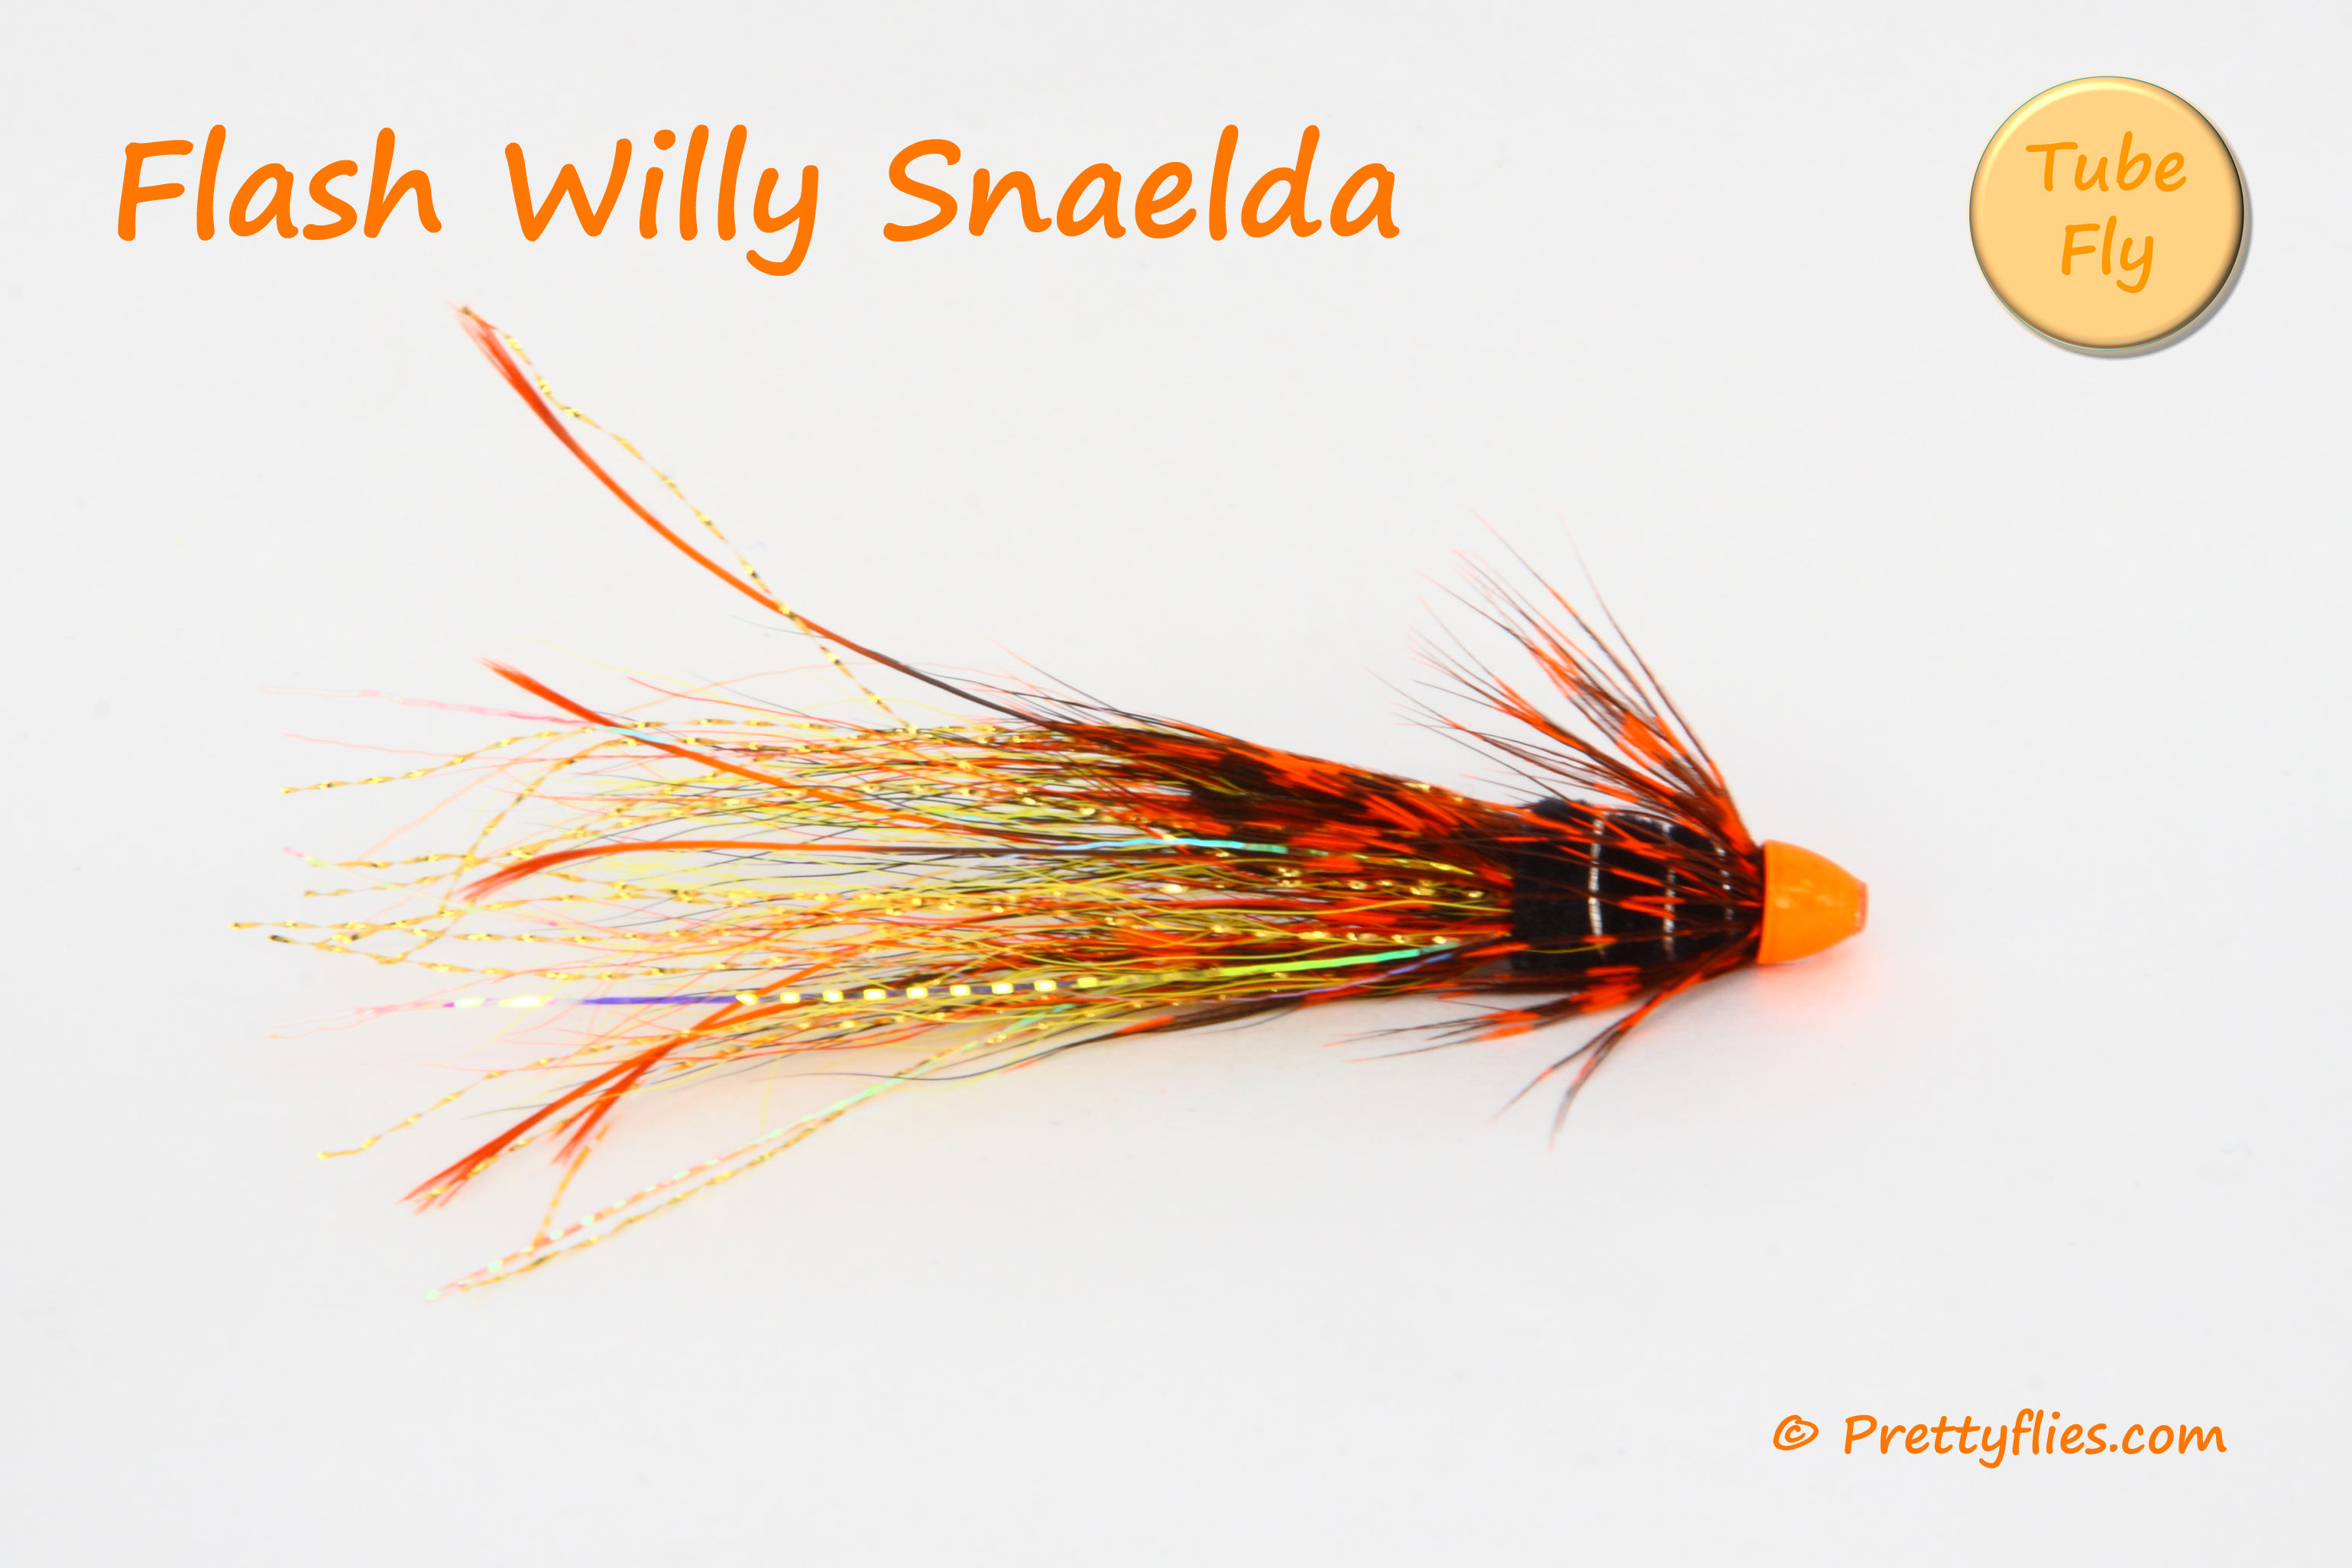 Flash Willy Snaelda copy.jpg